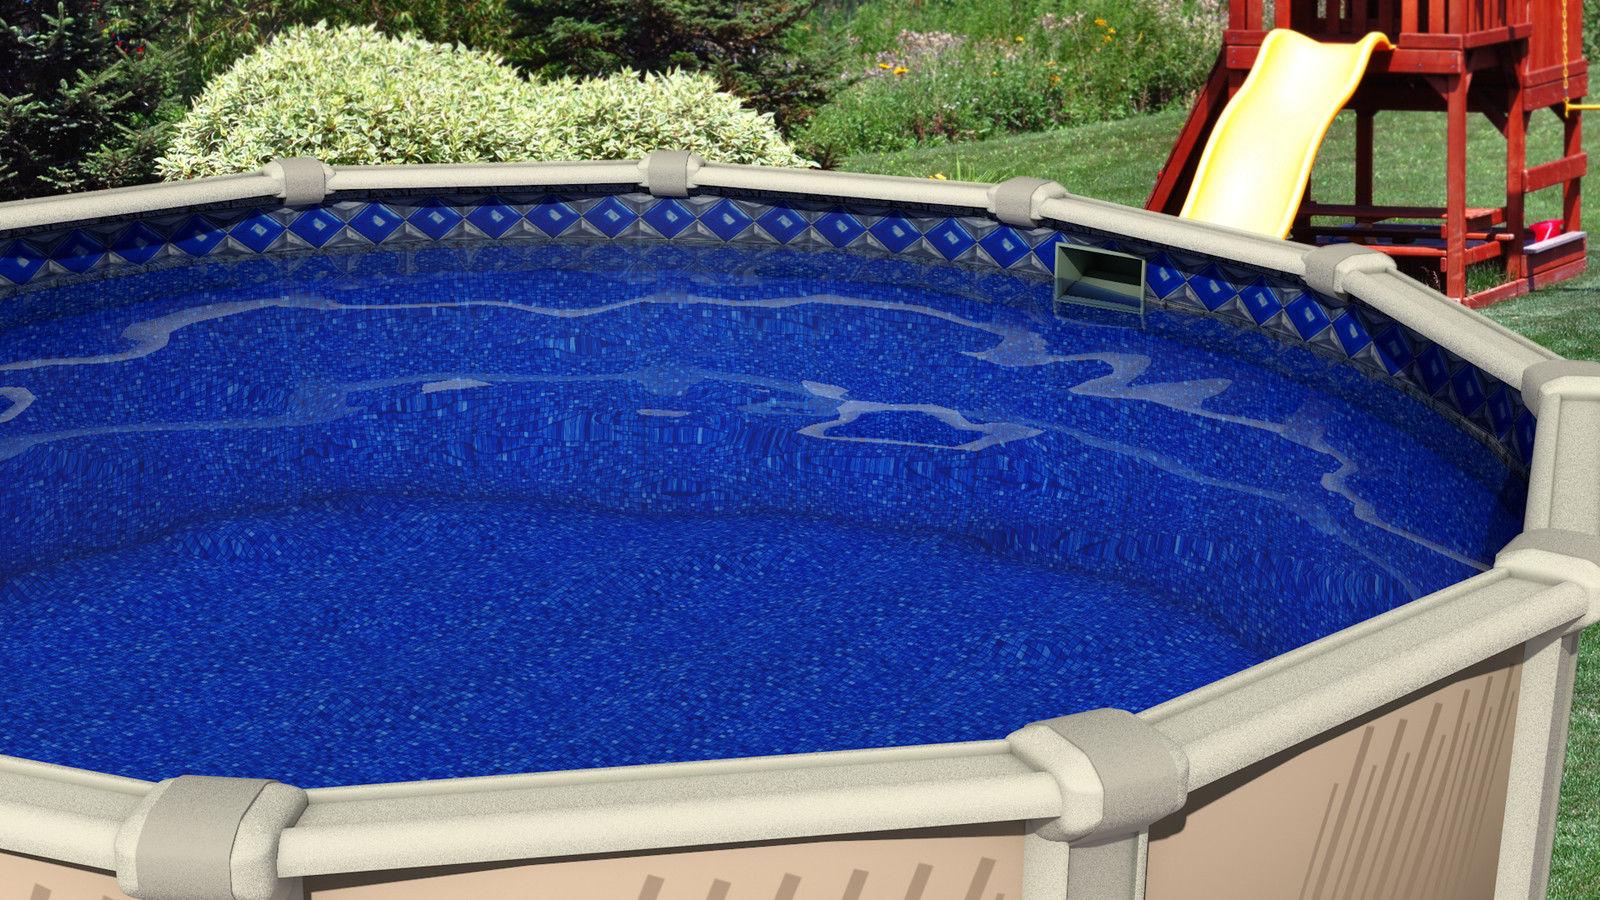 27 ft round unibead 48 inch swimming pool liner 25 gauge